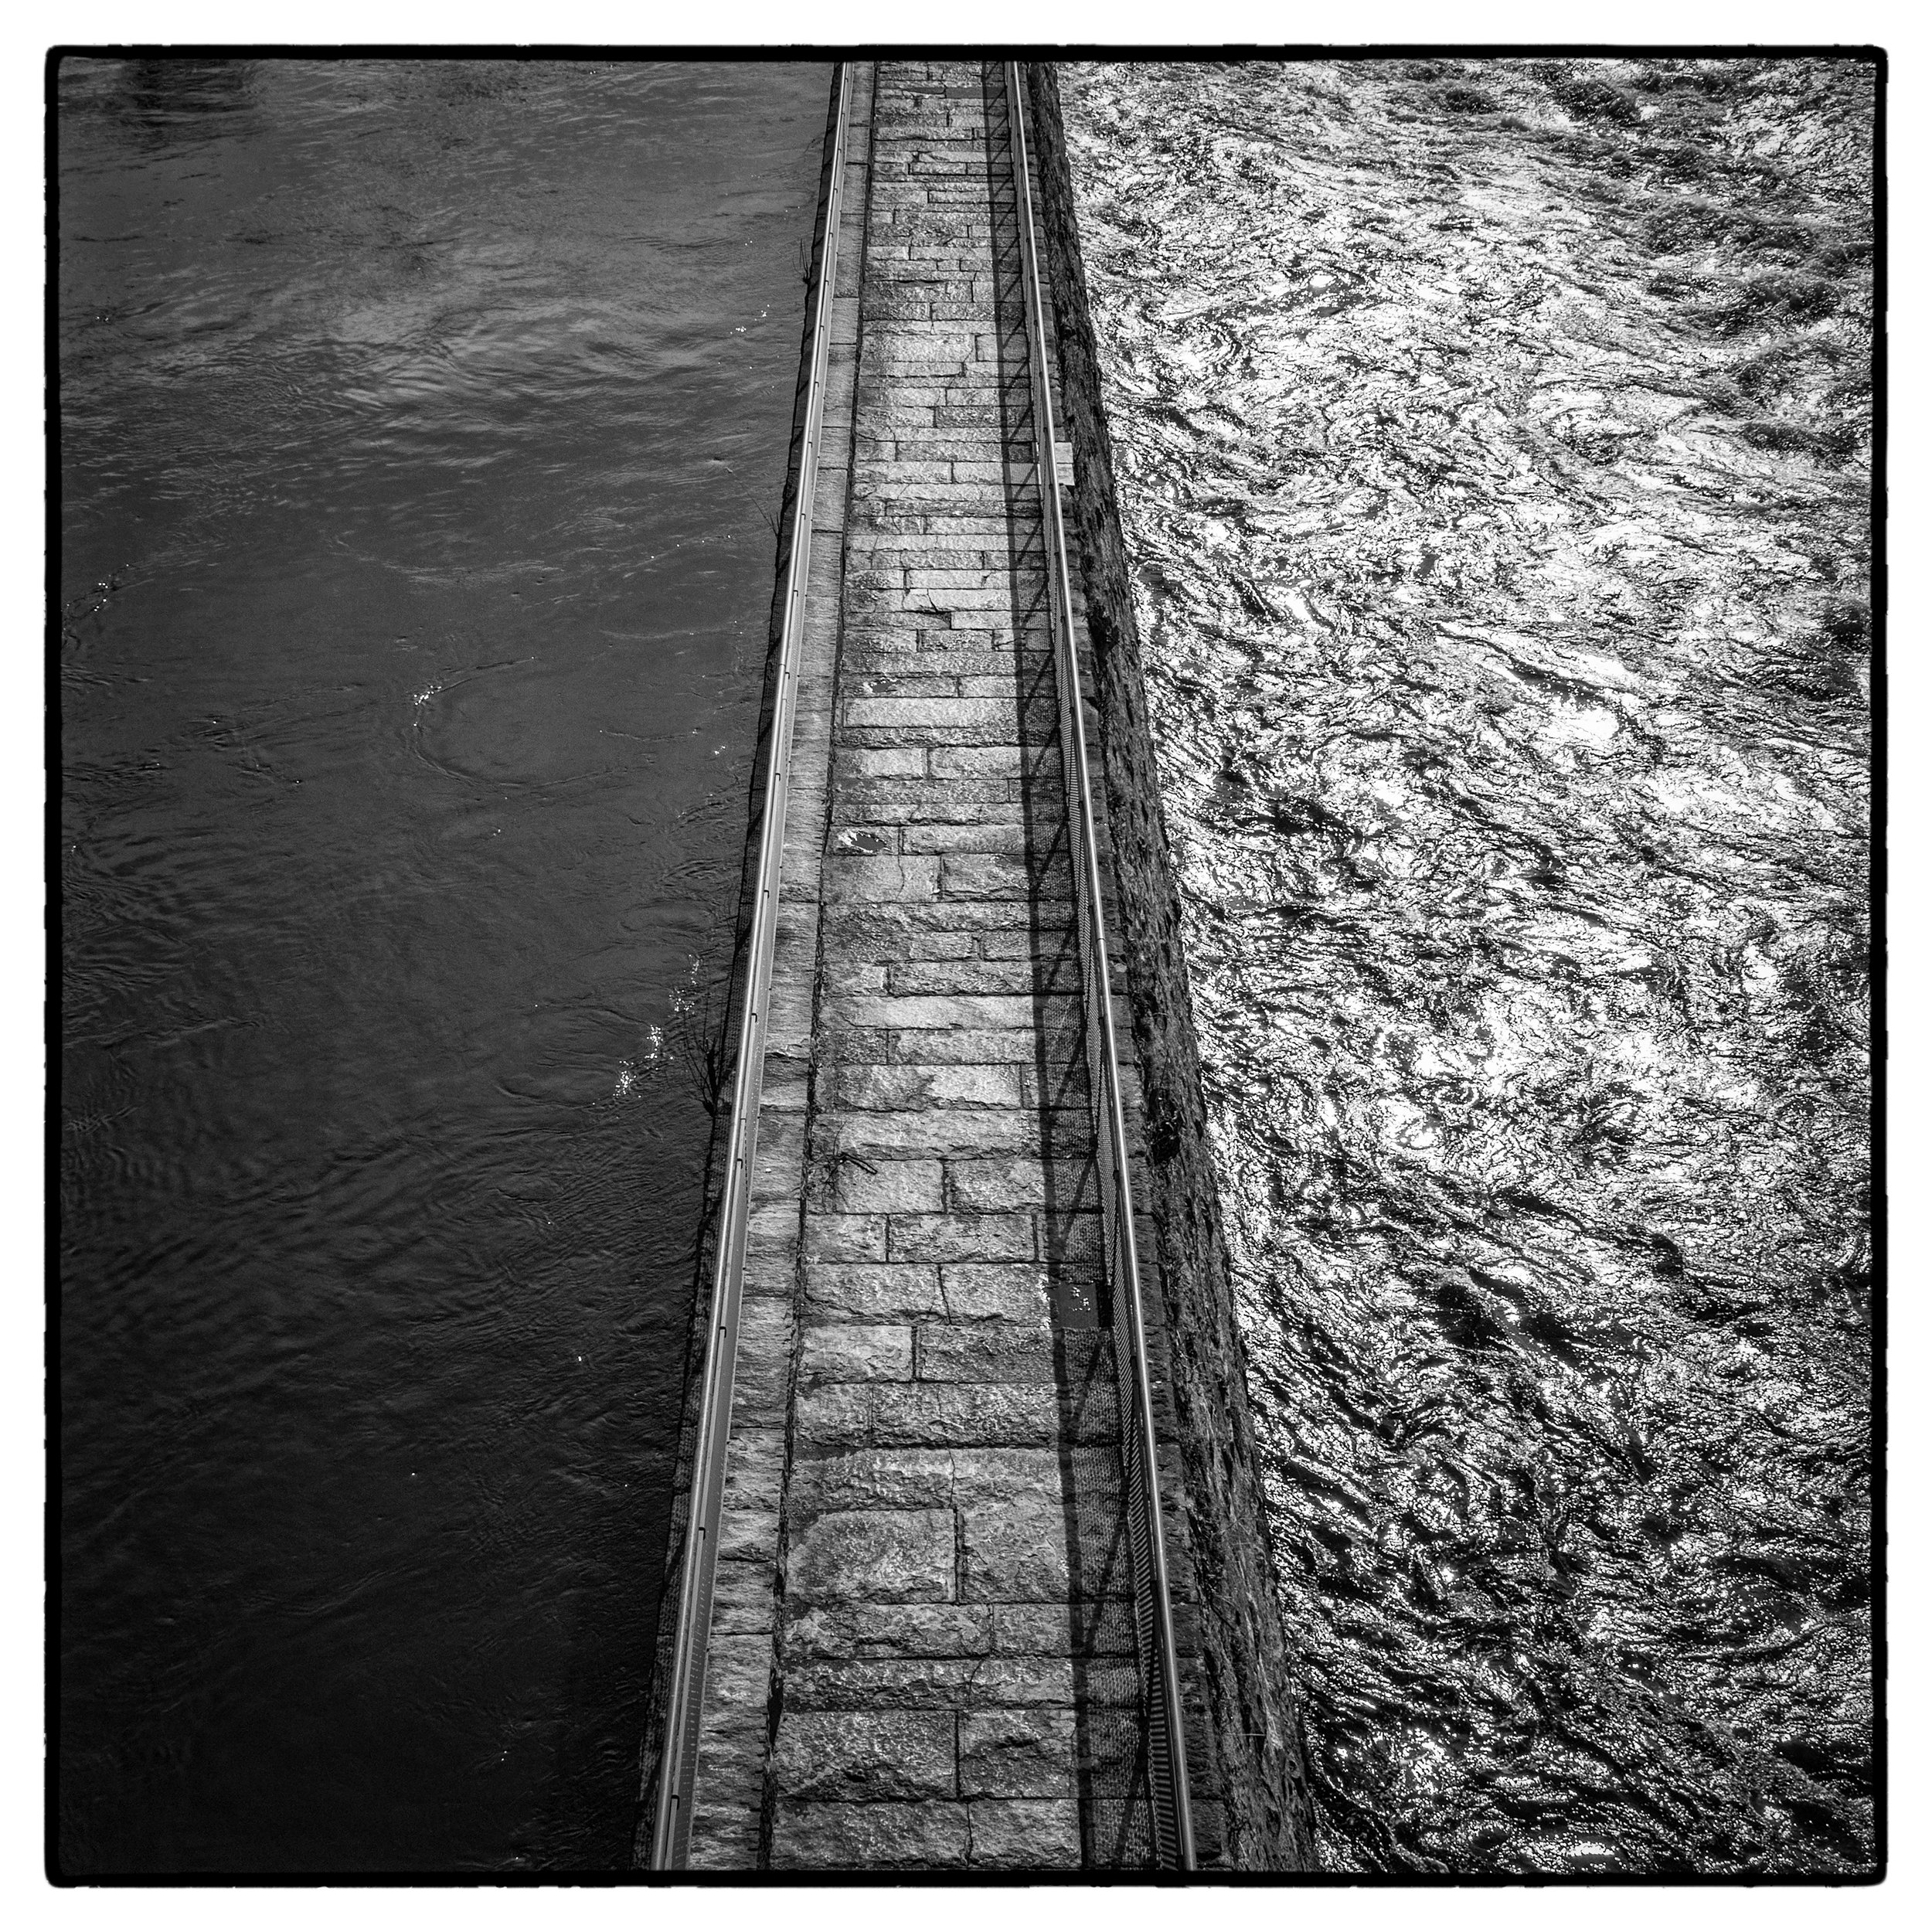 The_River_Walk_V2_2017_Jeff_Caplan.jpg